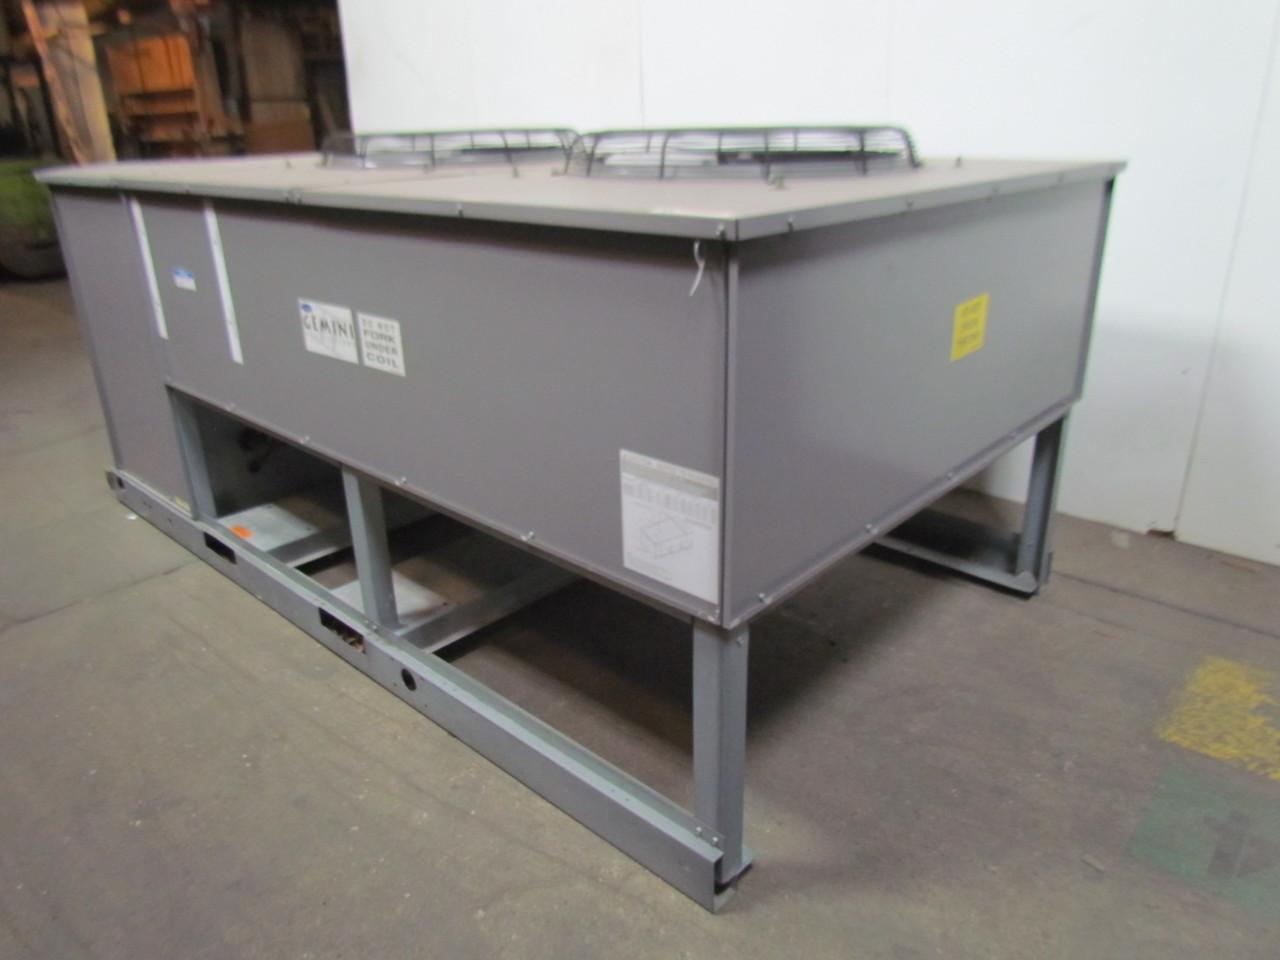 601 Gemini Split 26.7 Ton Commercial Air Cooled Condensing Unit eBay #644938